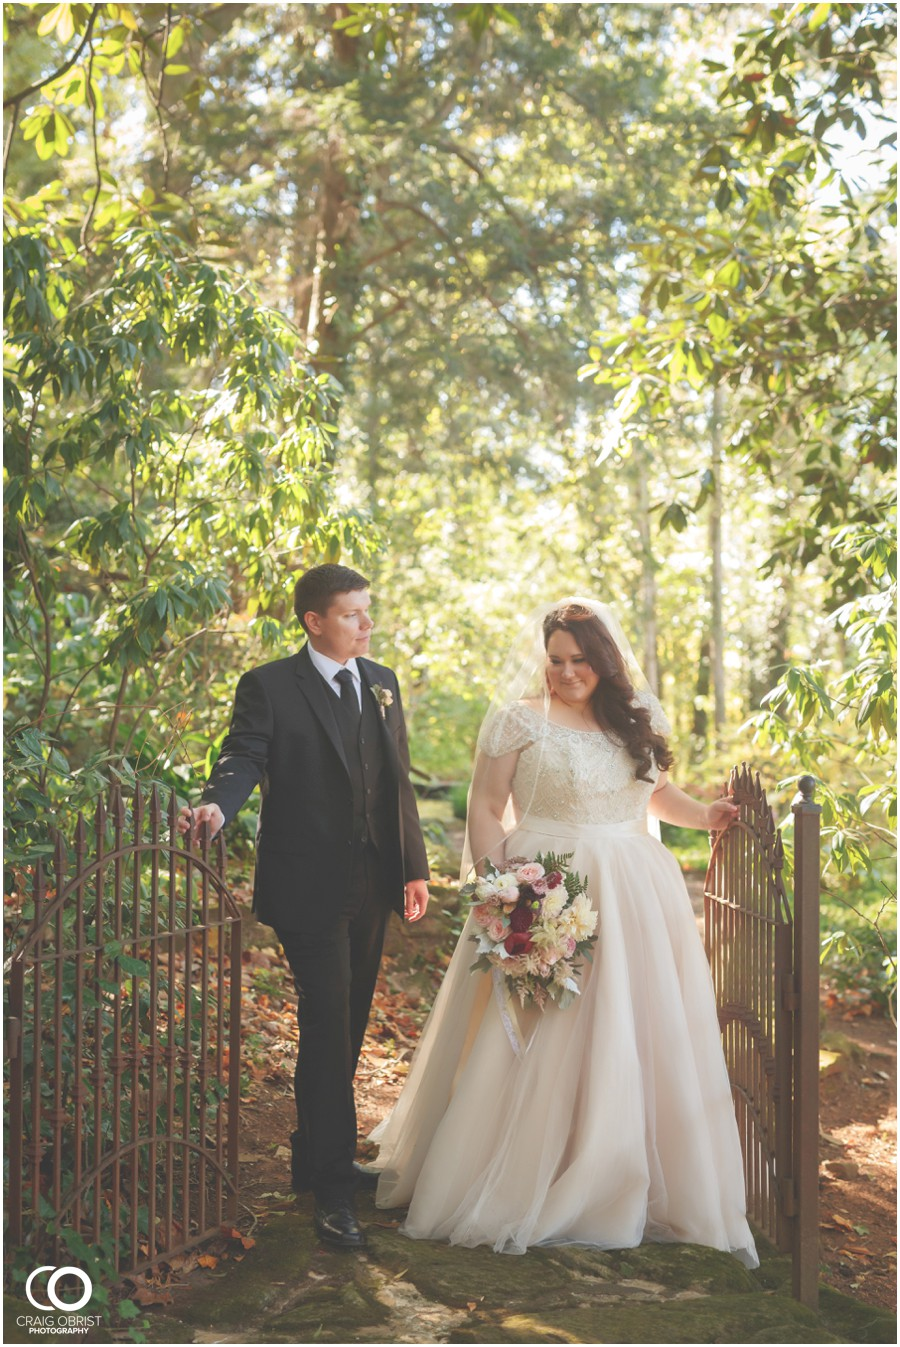 Dunaway gardens Wedding Fairytale Disney Portraits_0041.jpg